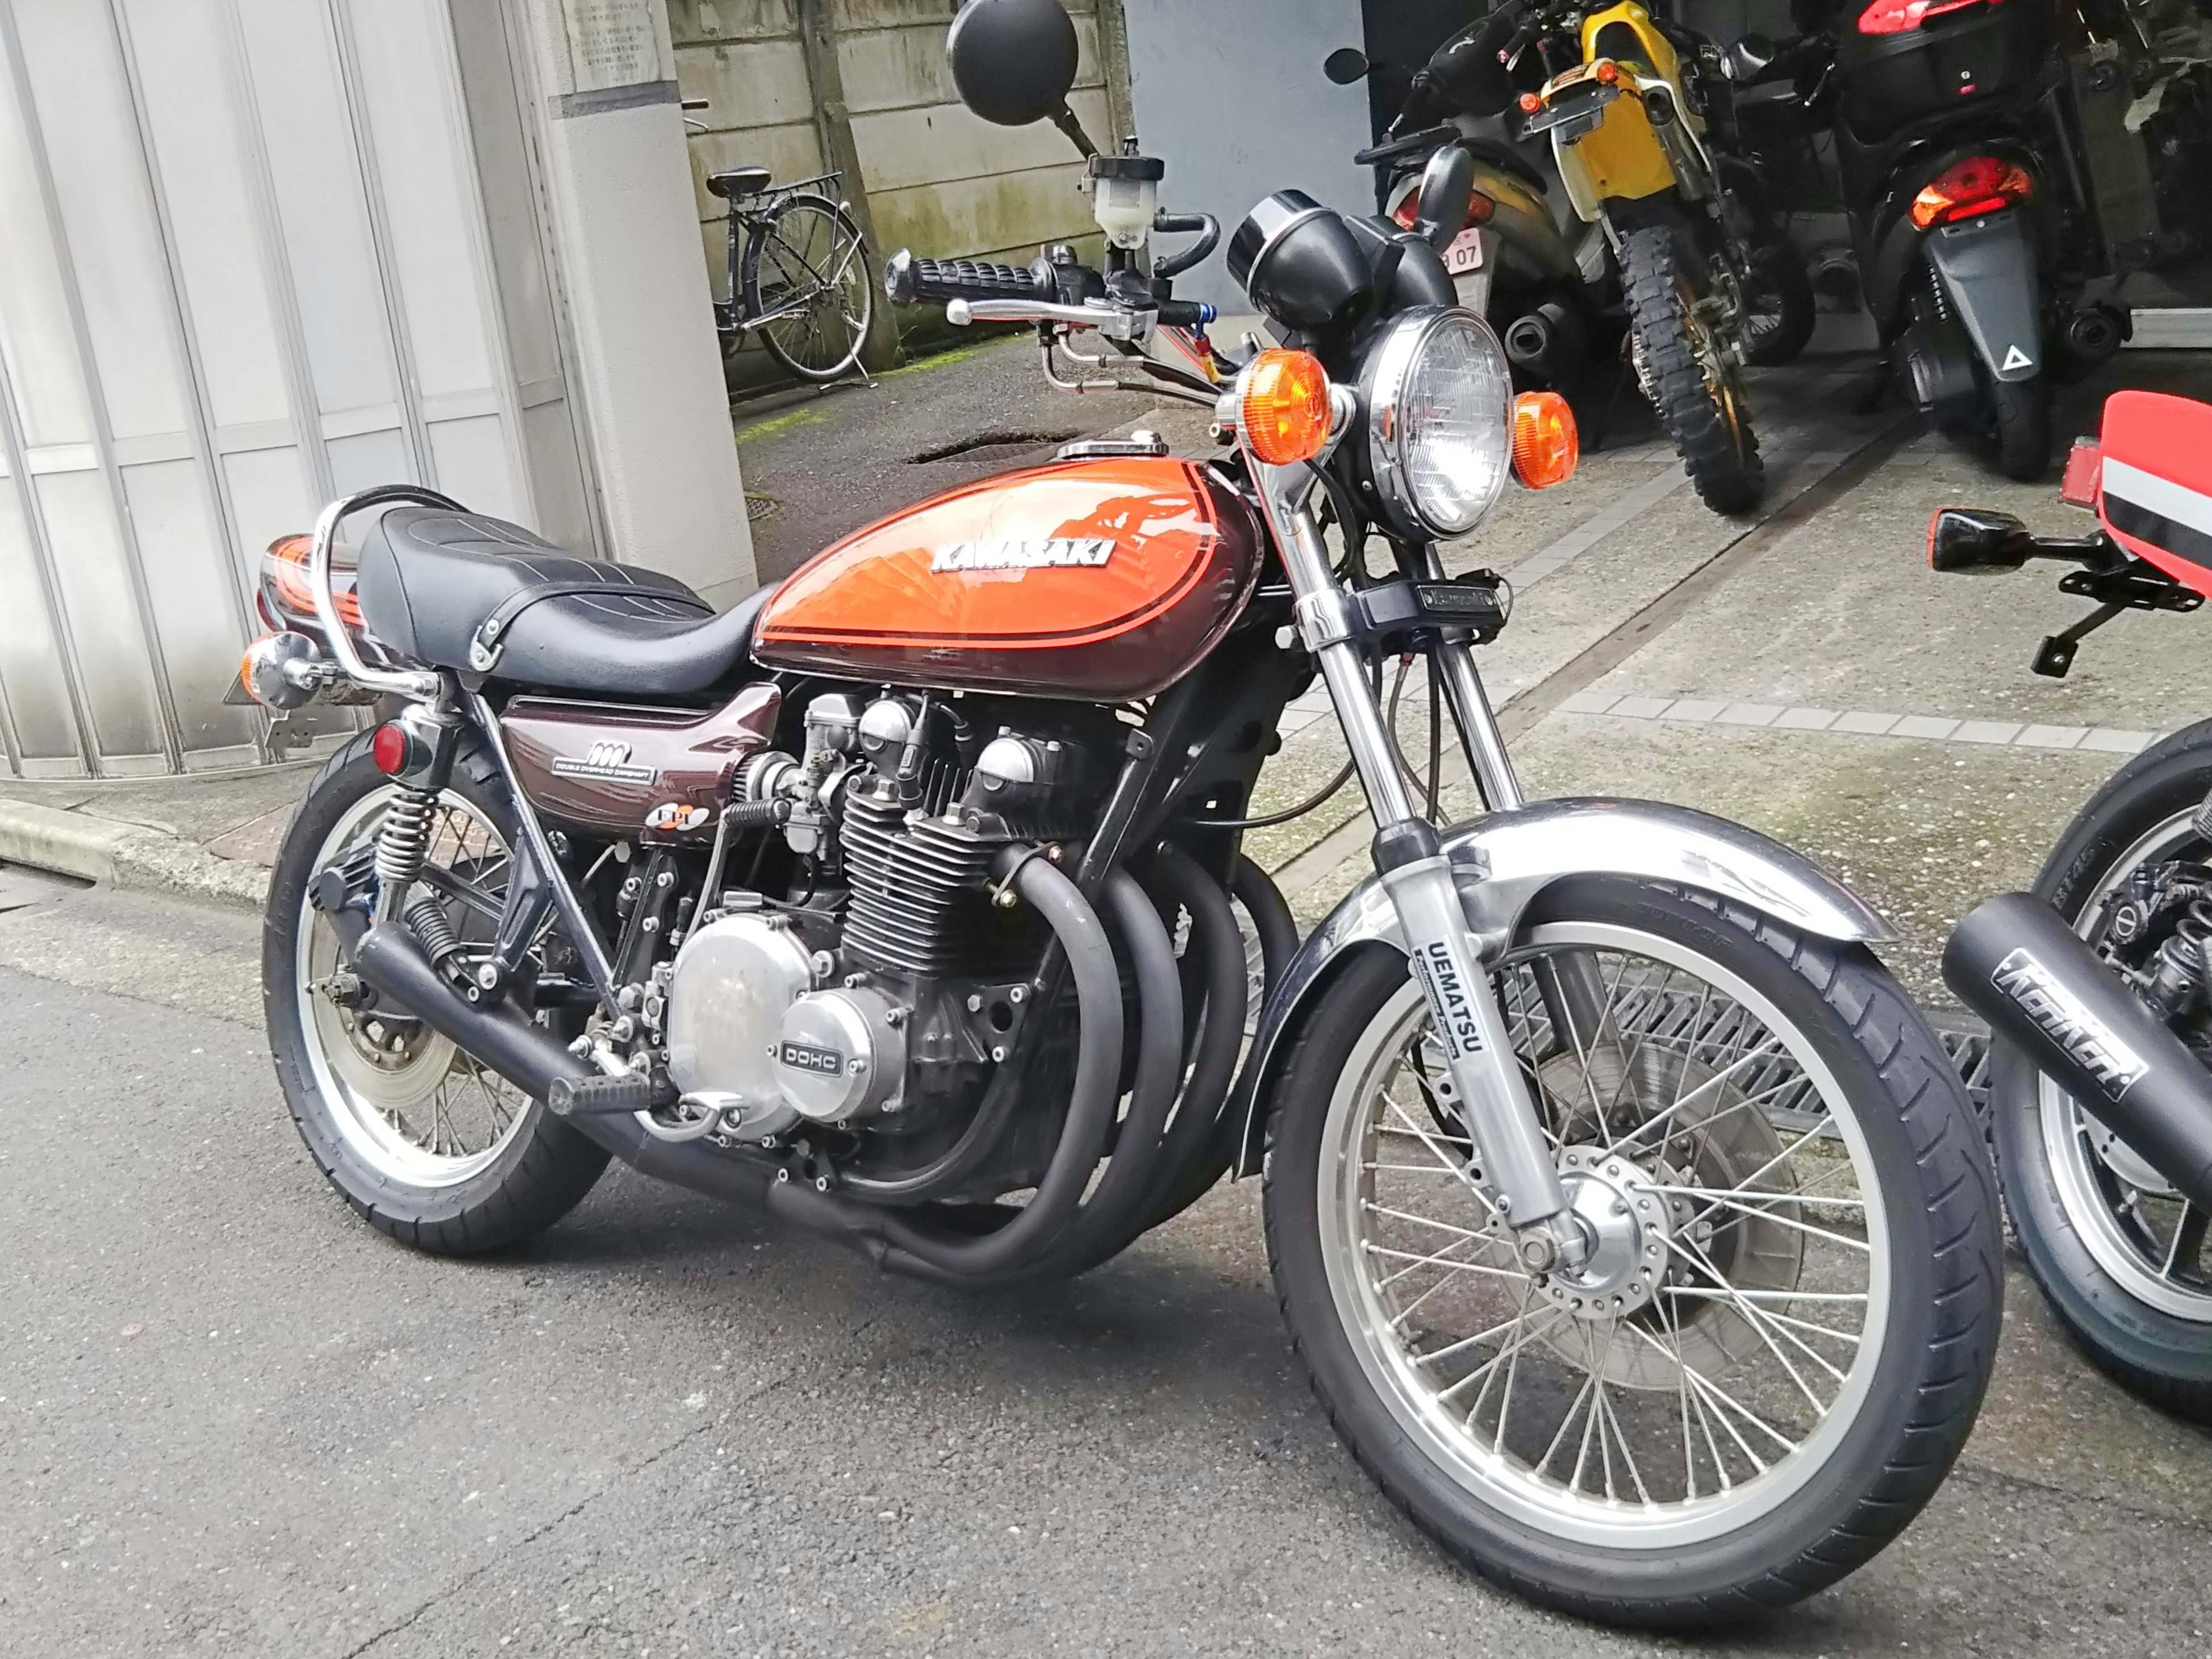 KZ1000